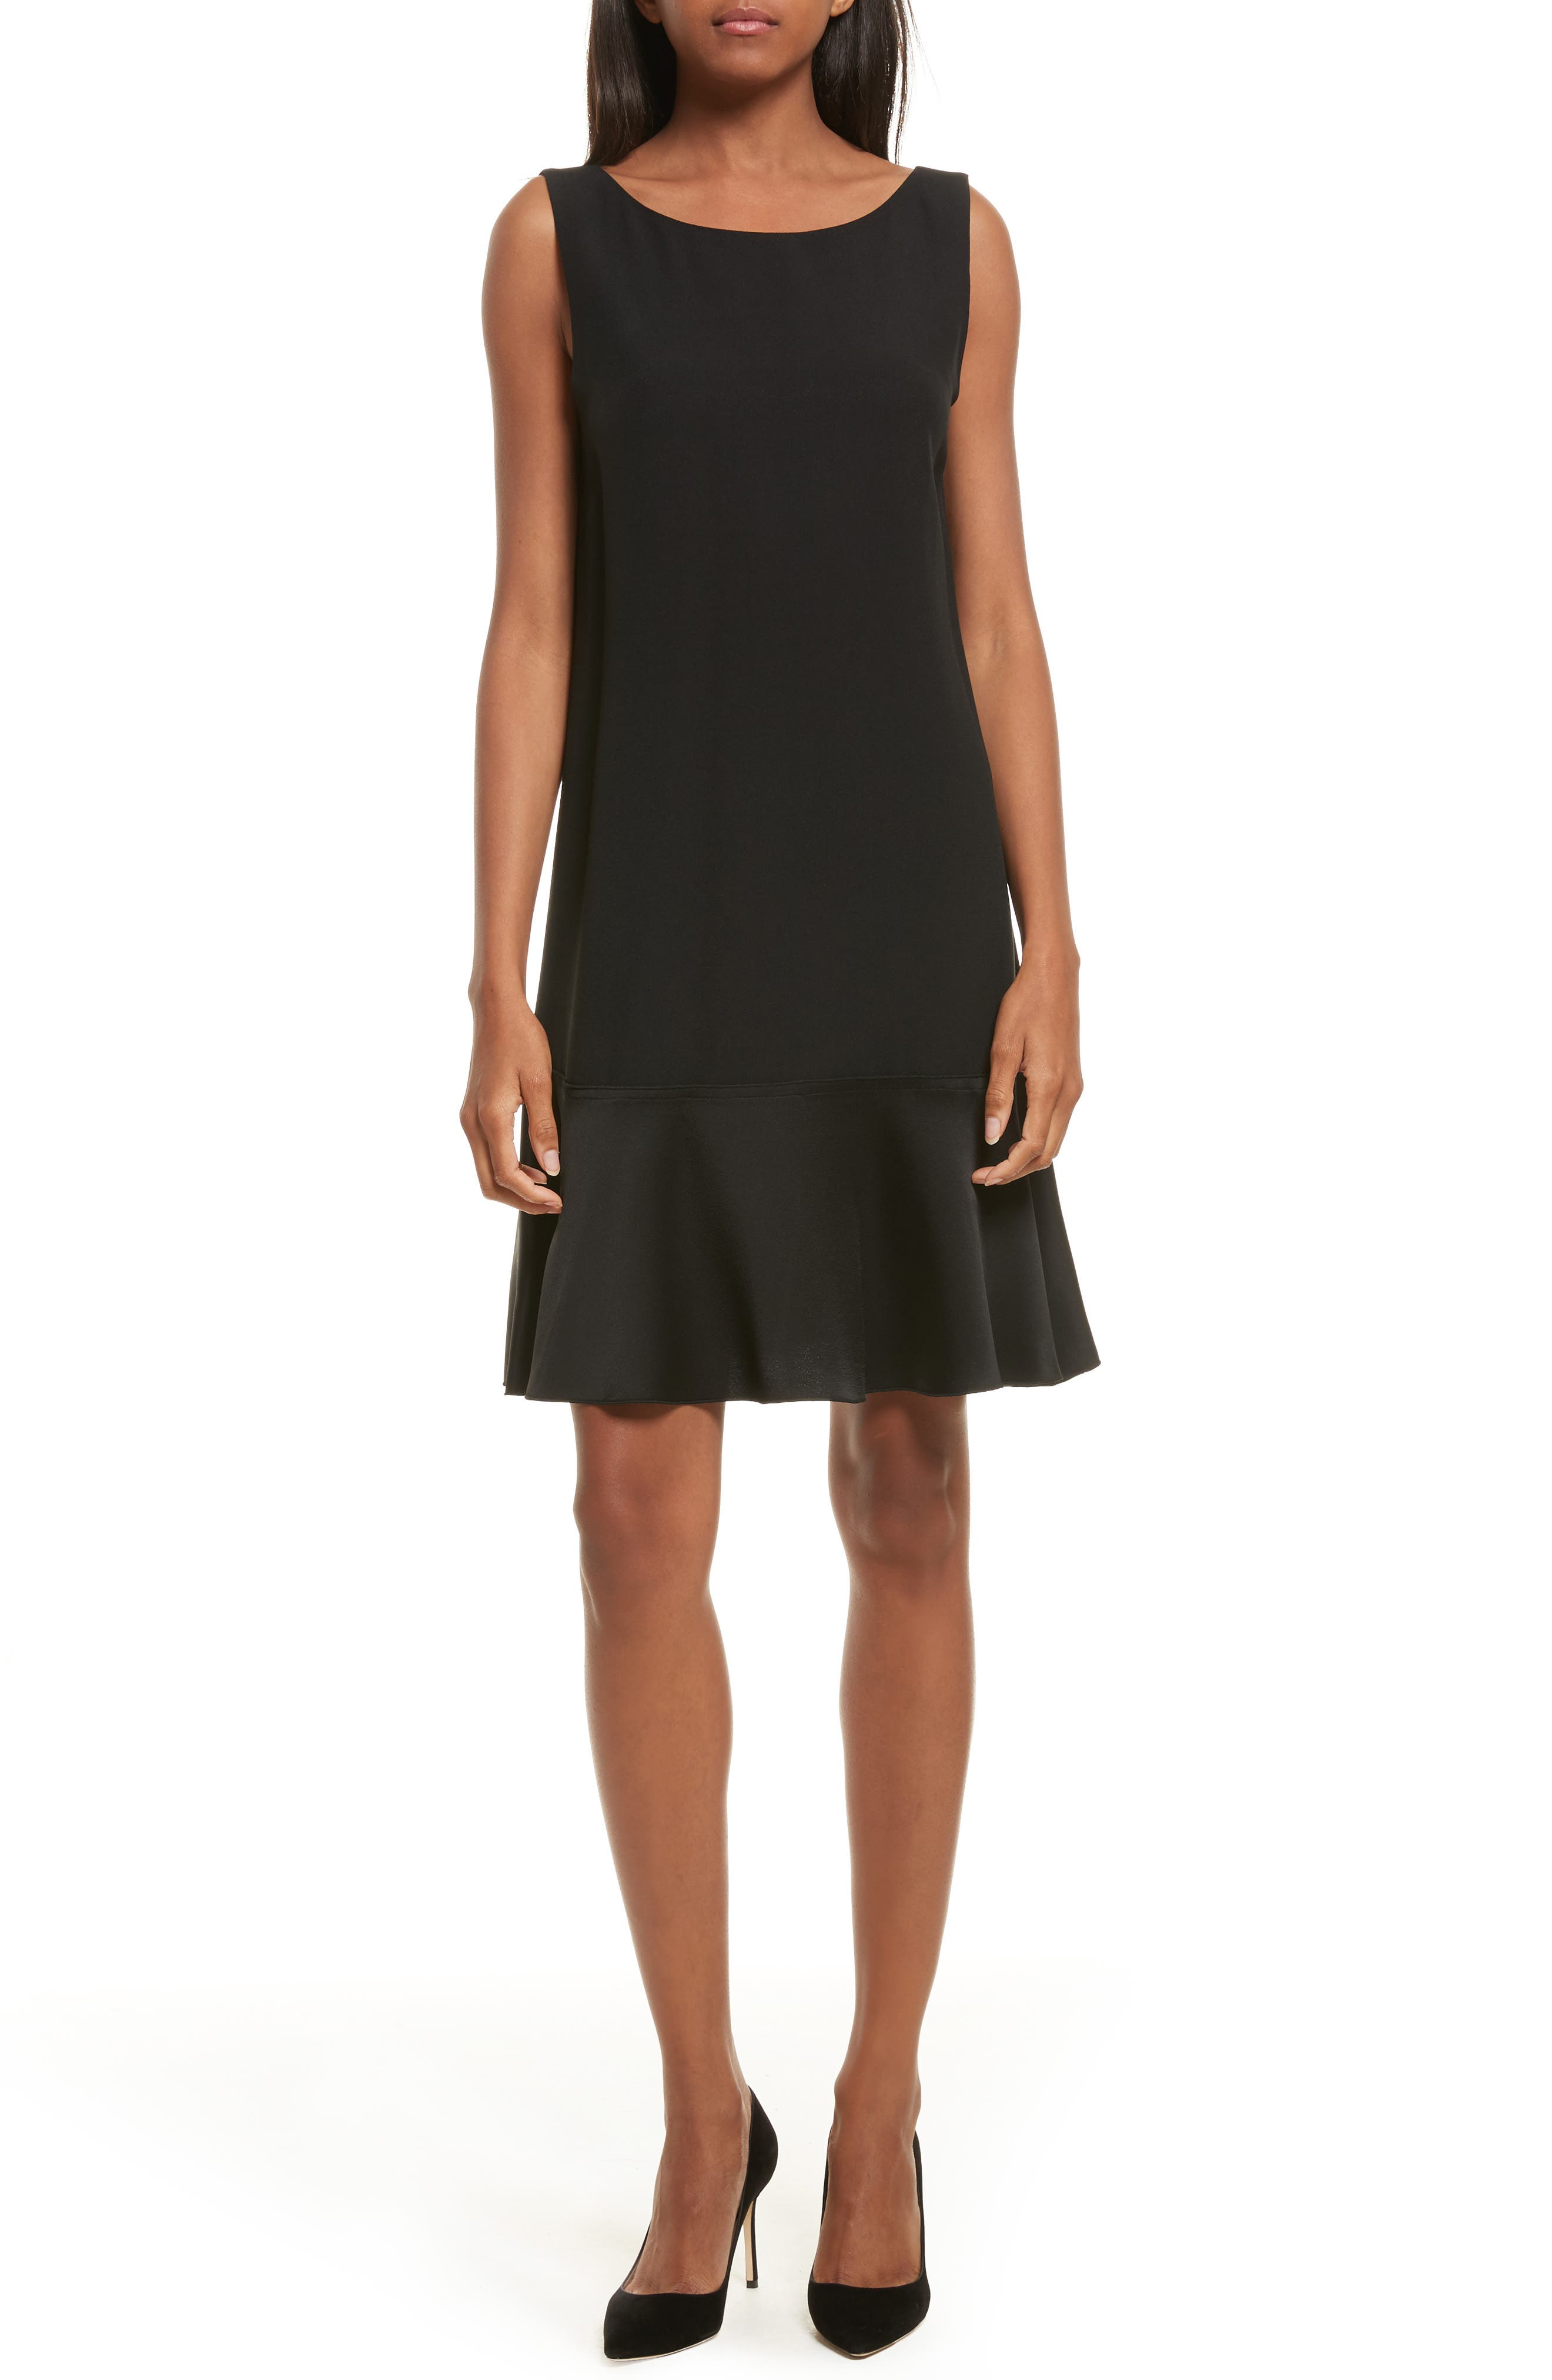 Main Image - Theory Kensington Flirty Flare Dress